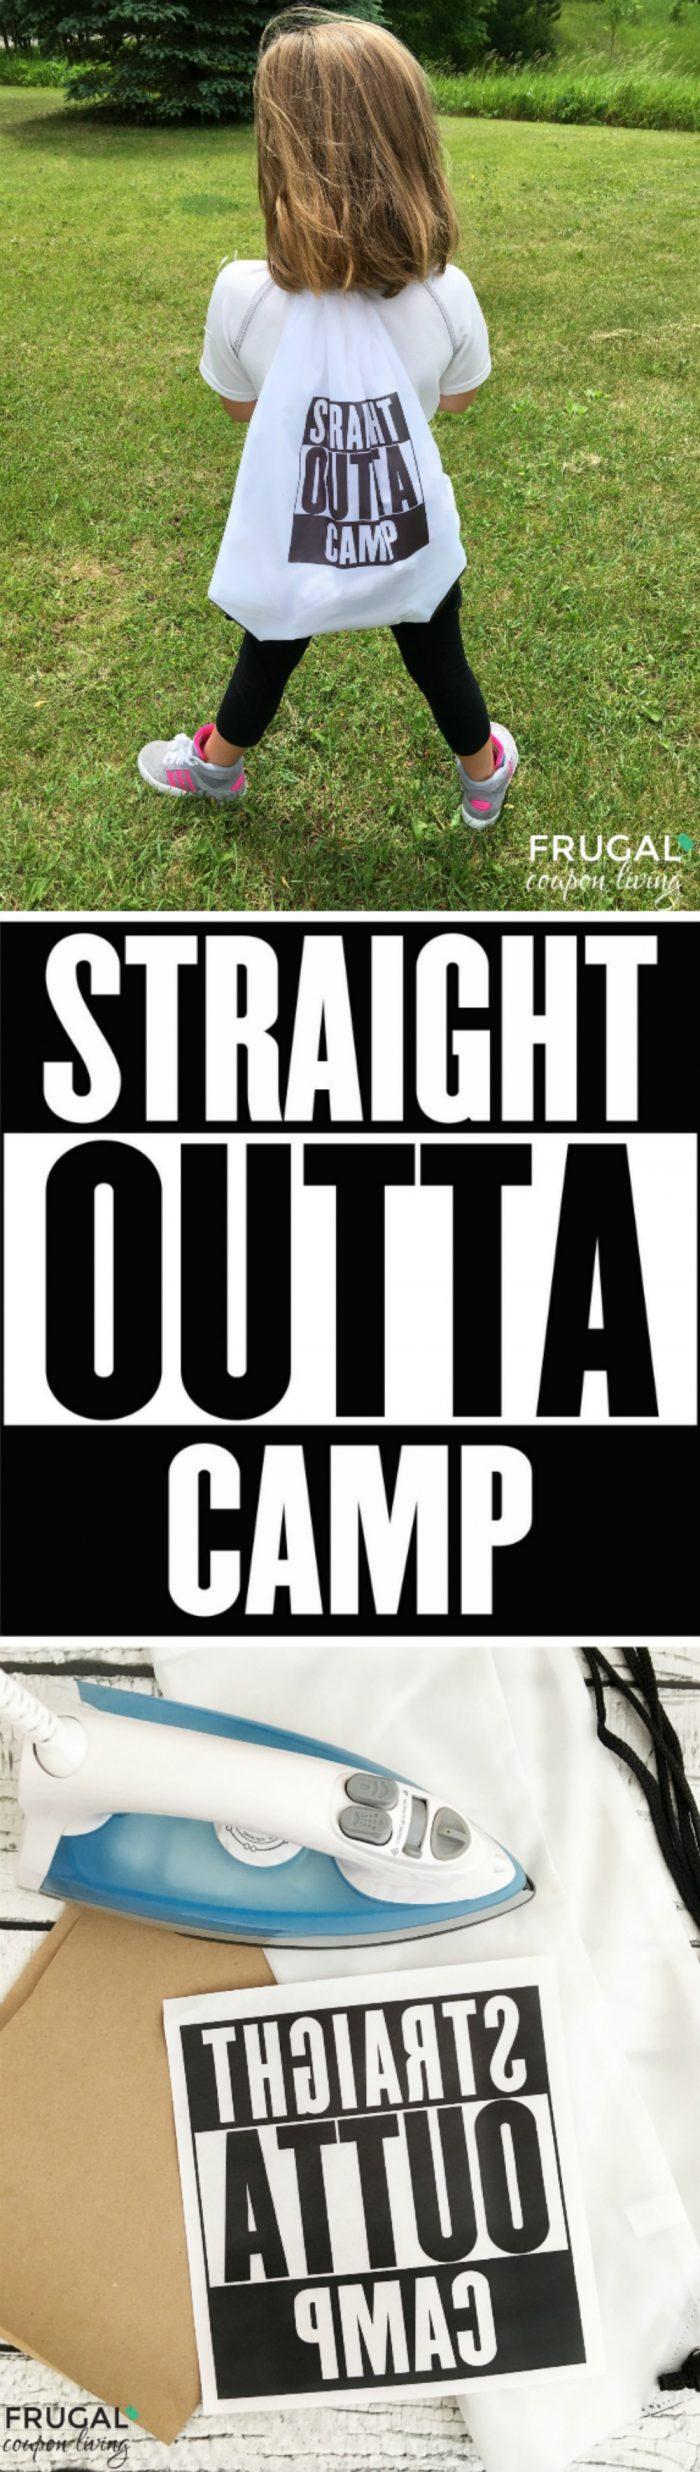 Roaring camp discount coupons